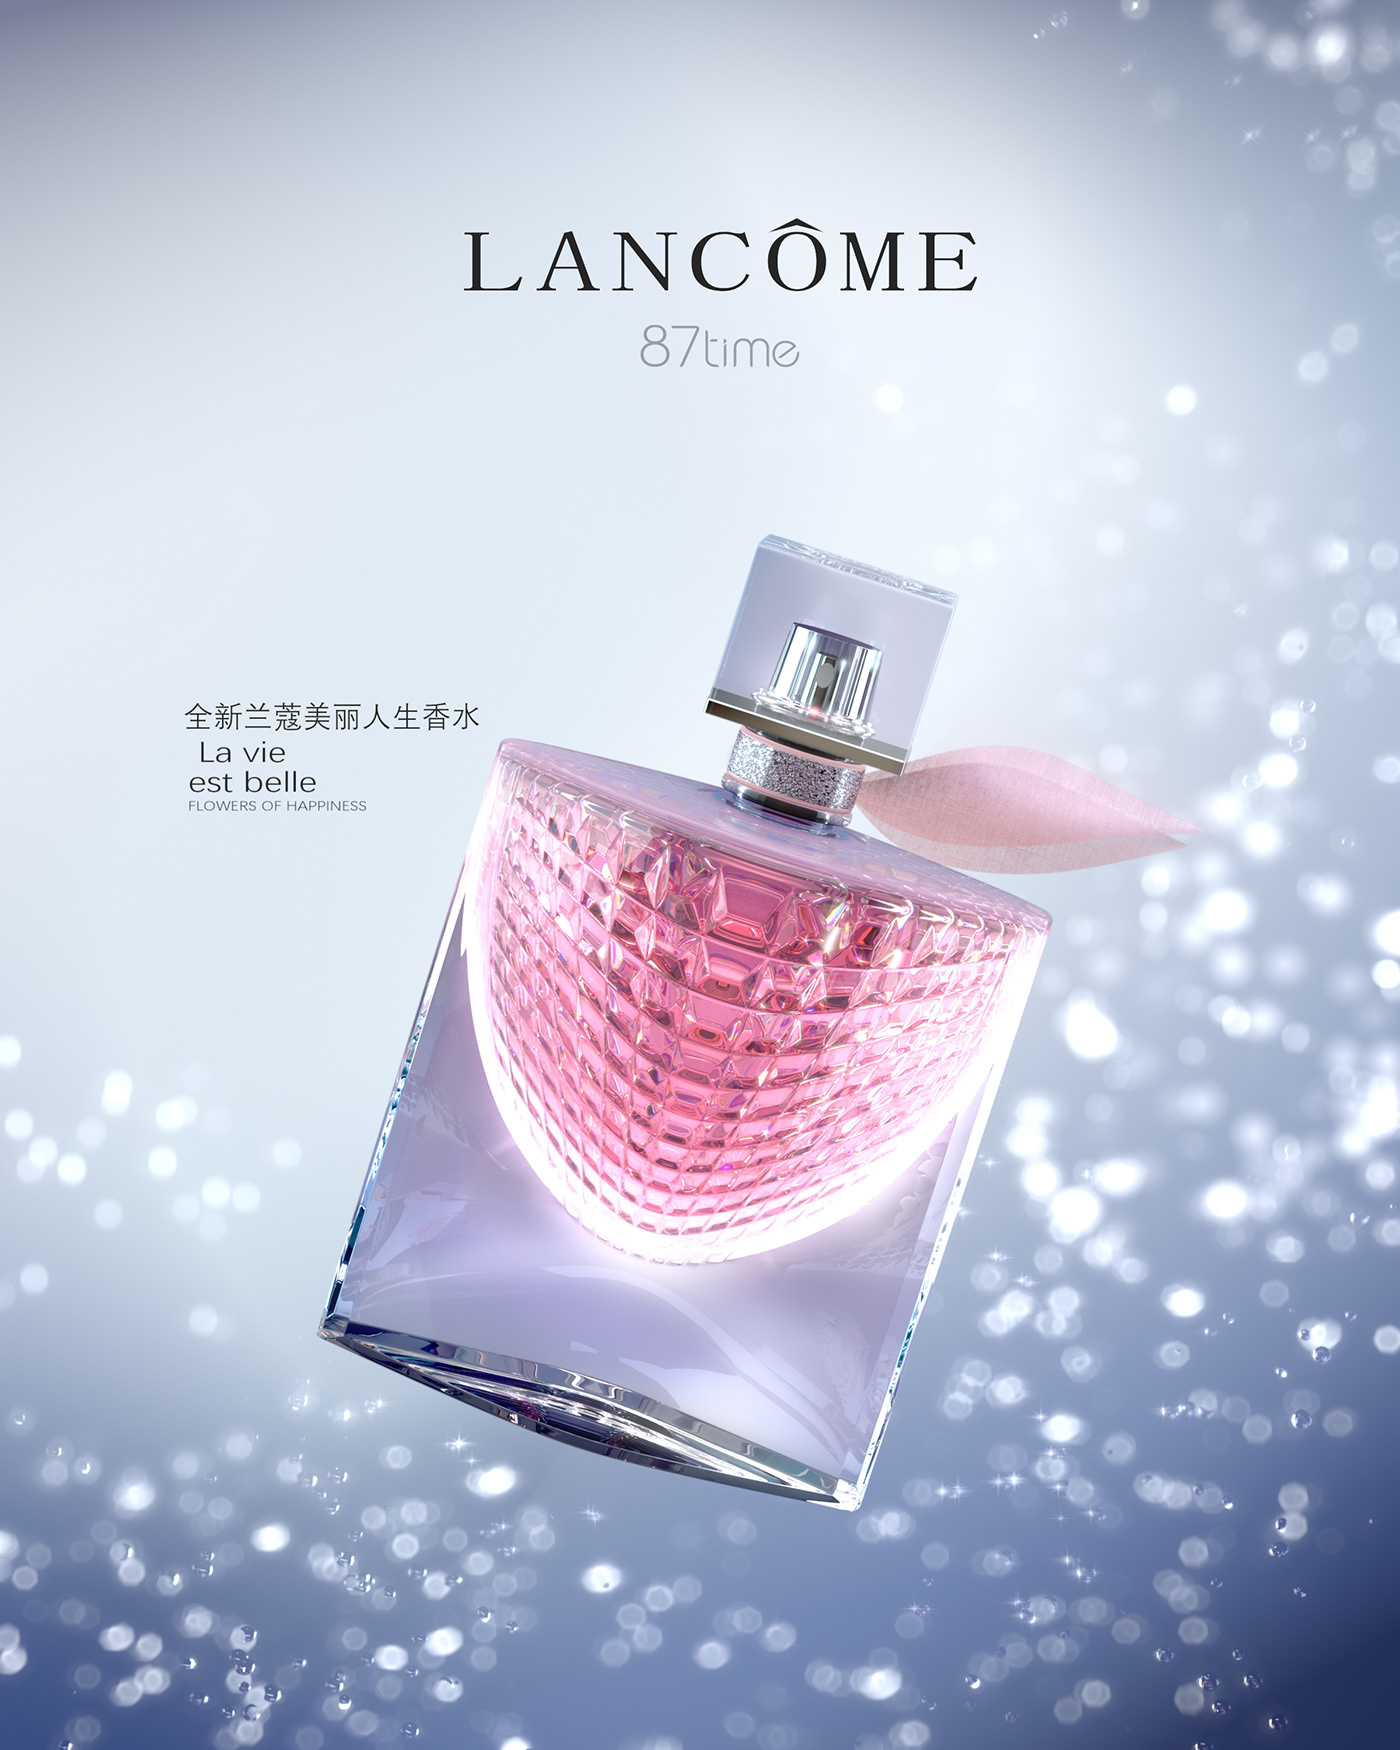 Lancome 美麗人生香水 on Behance